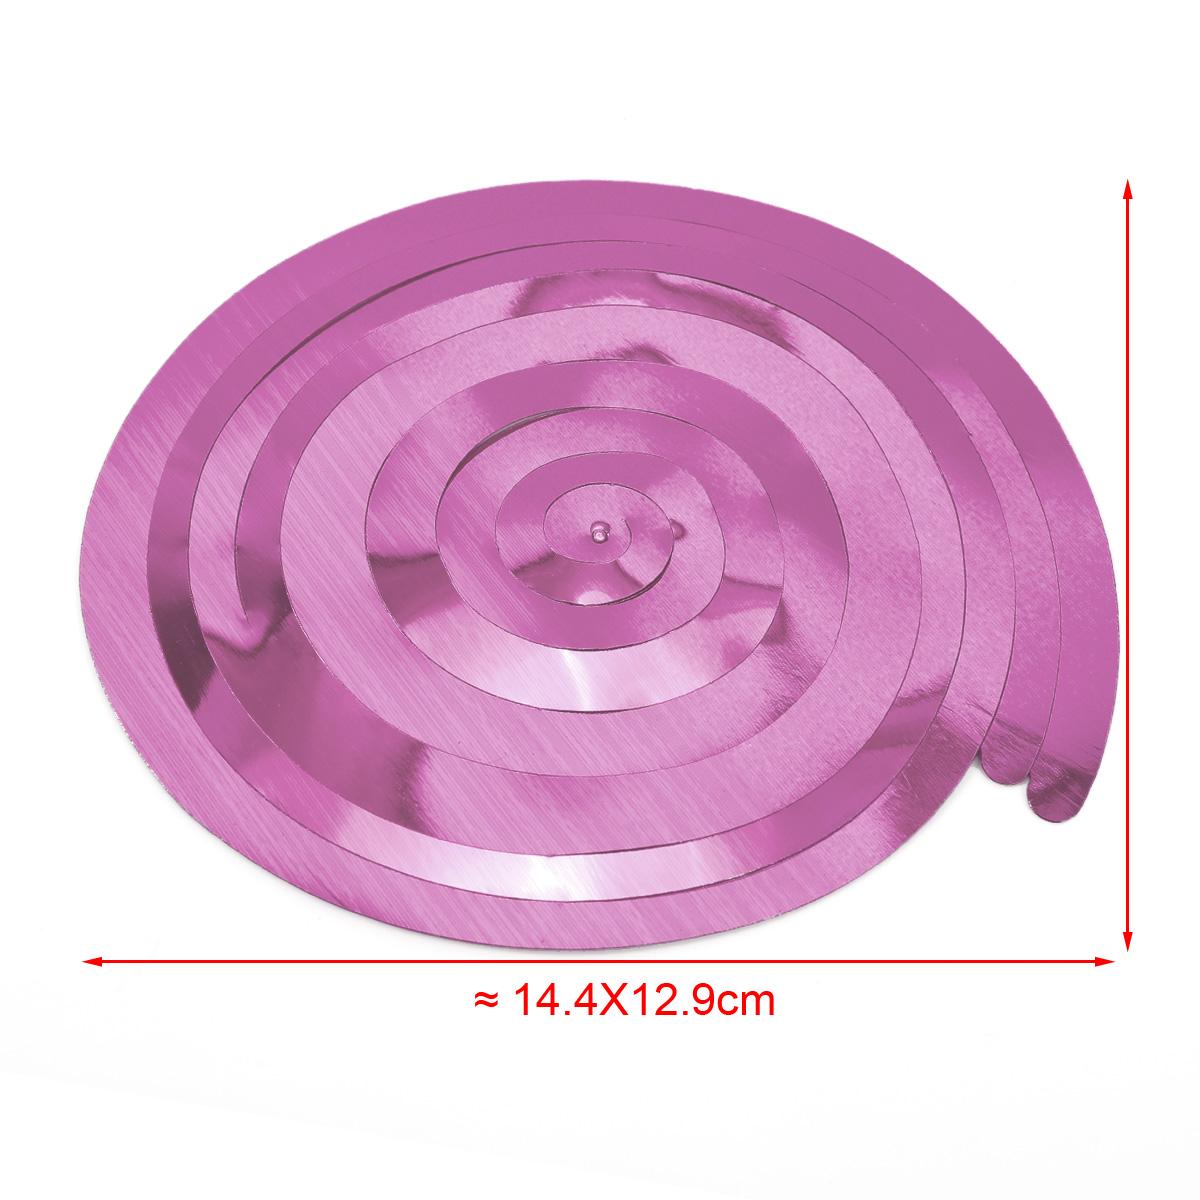 12x suspension spirale m tallis suspendre fushia rose vert bleu f te salle ebay. Black Bedroom Furniture Sets. Home Design Ideas